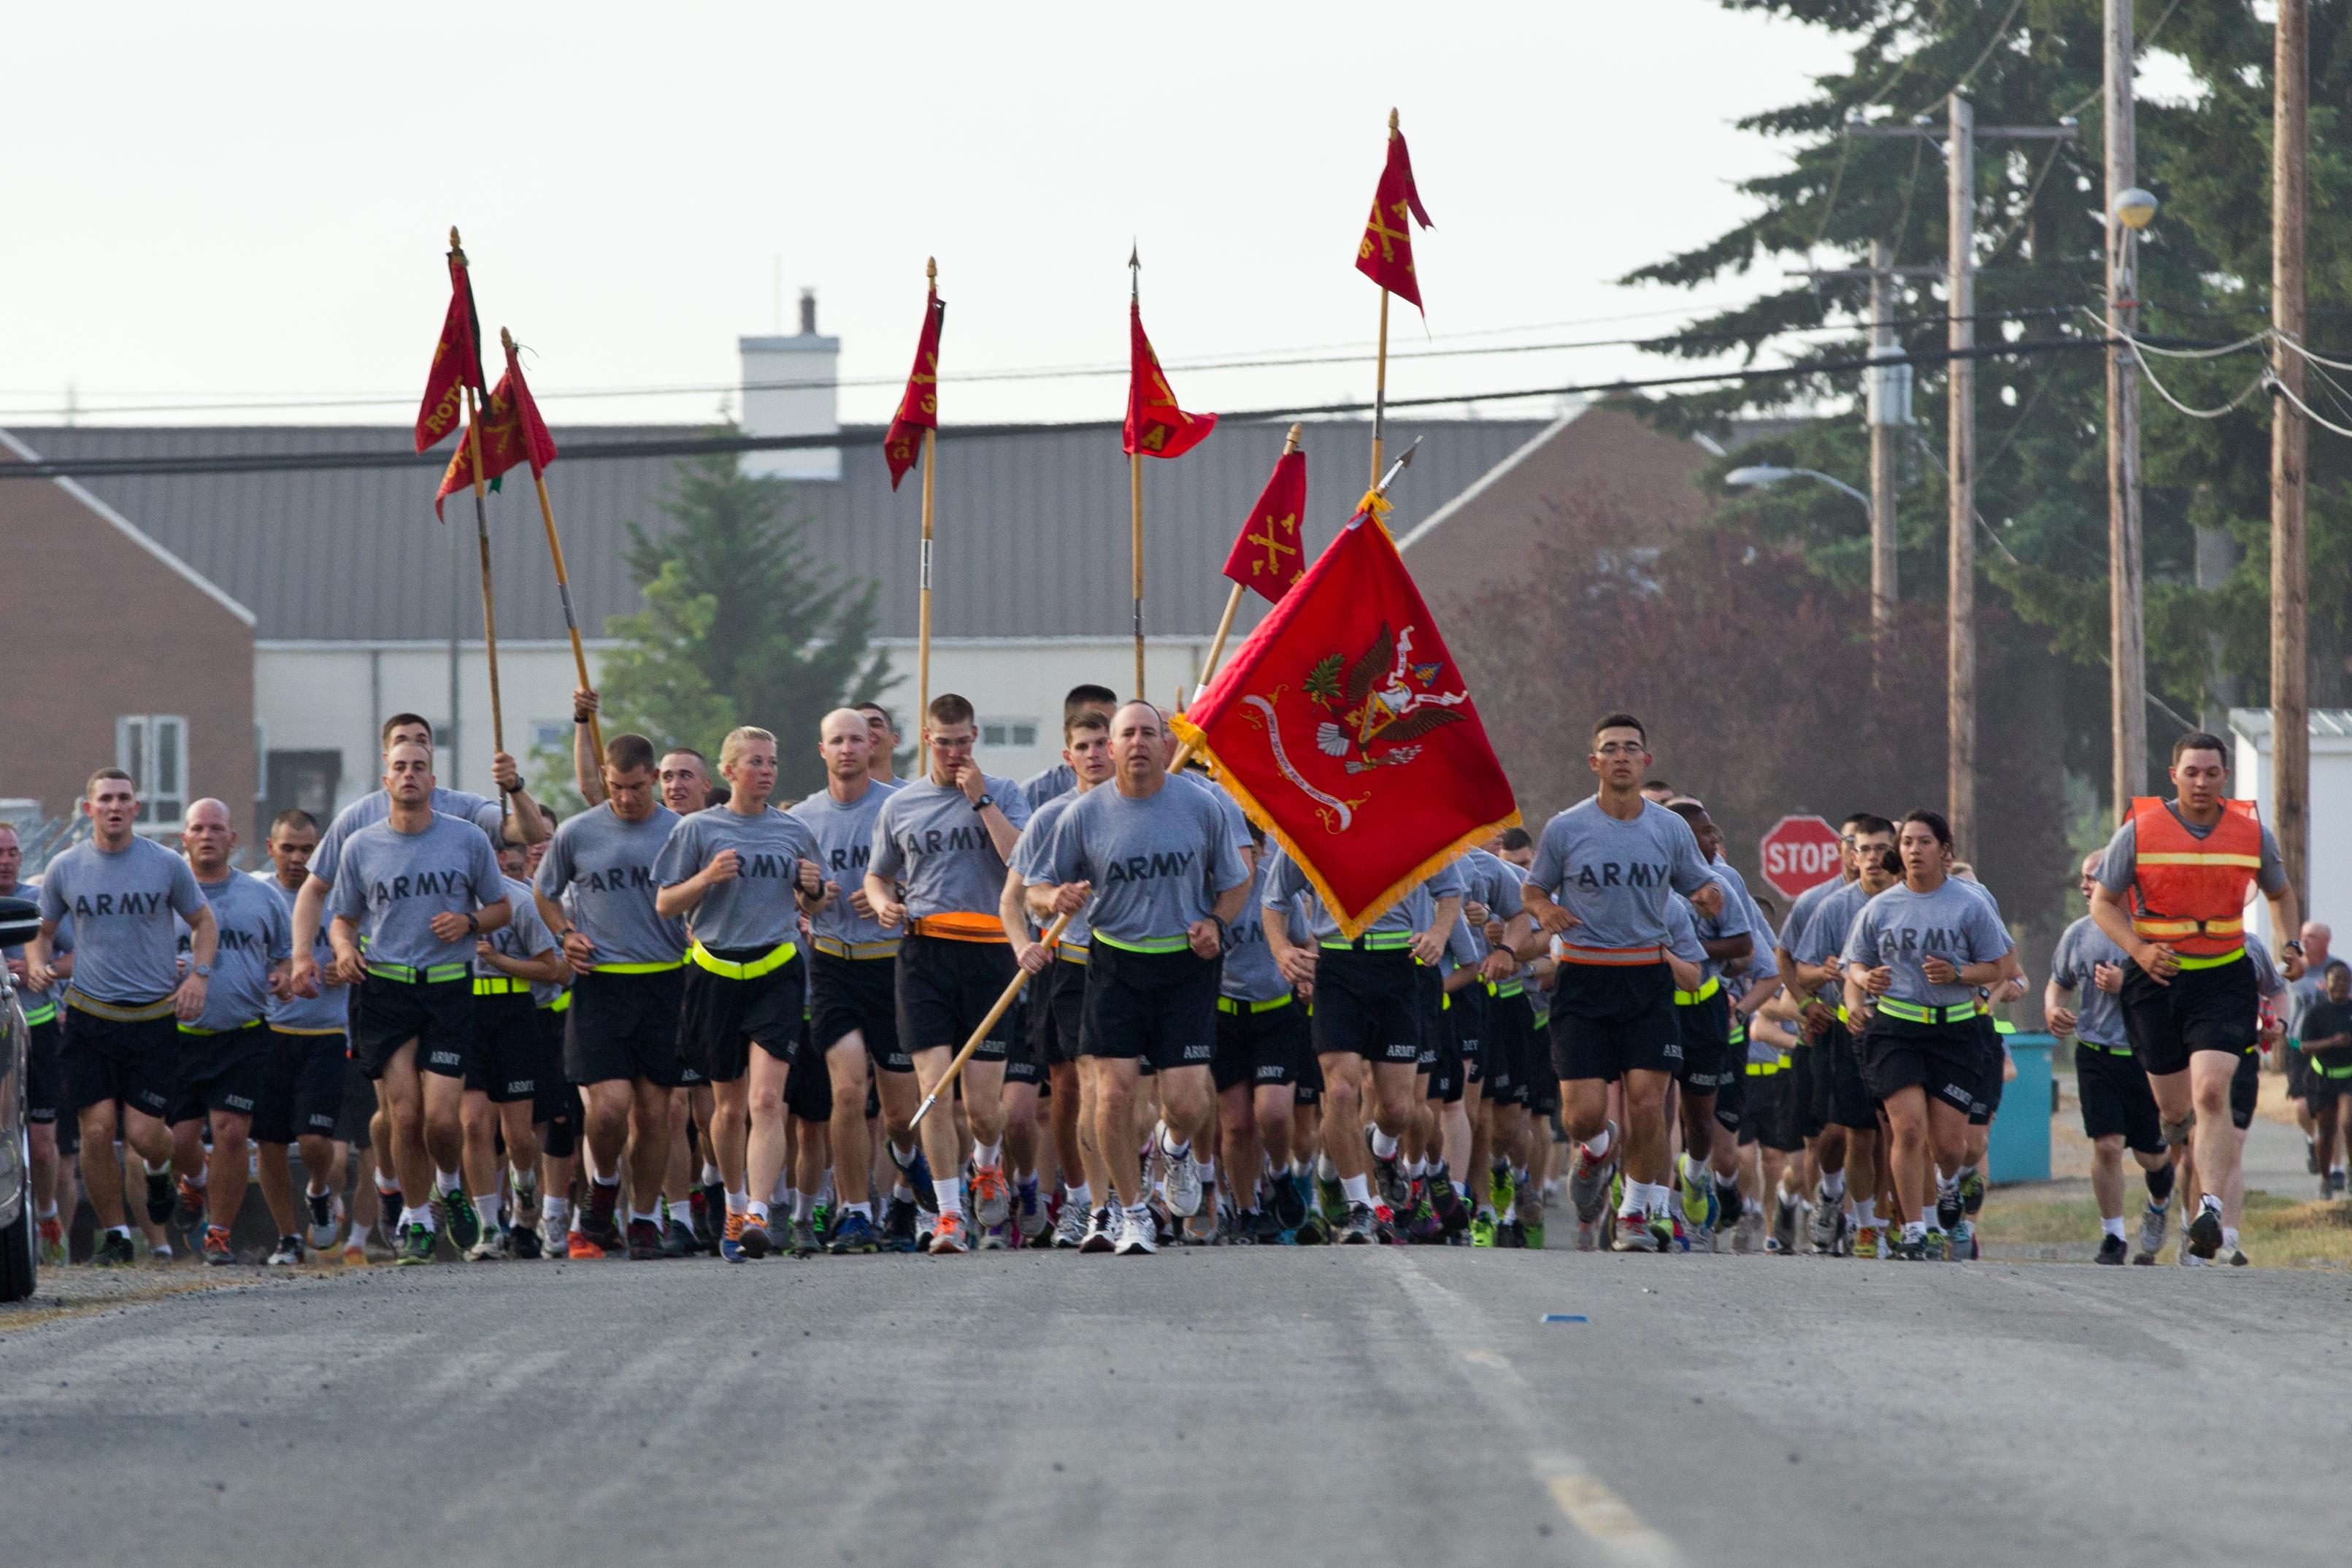 U.S. Army photo Heather Cortright.